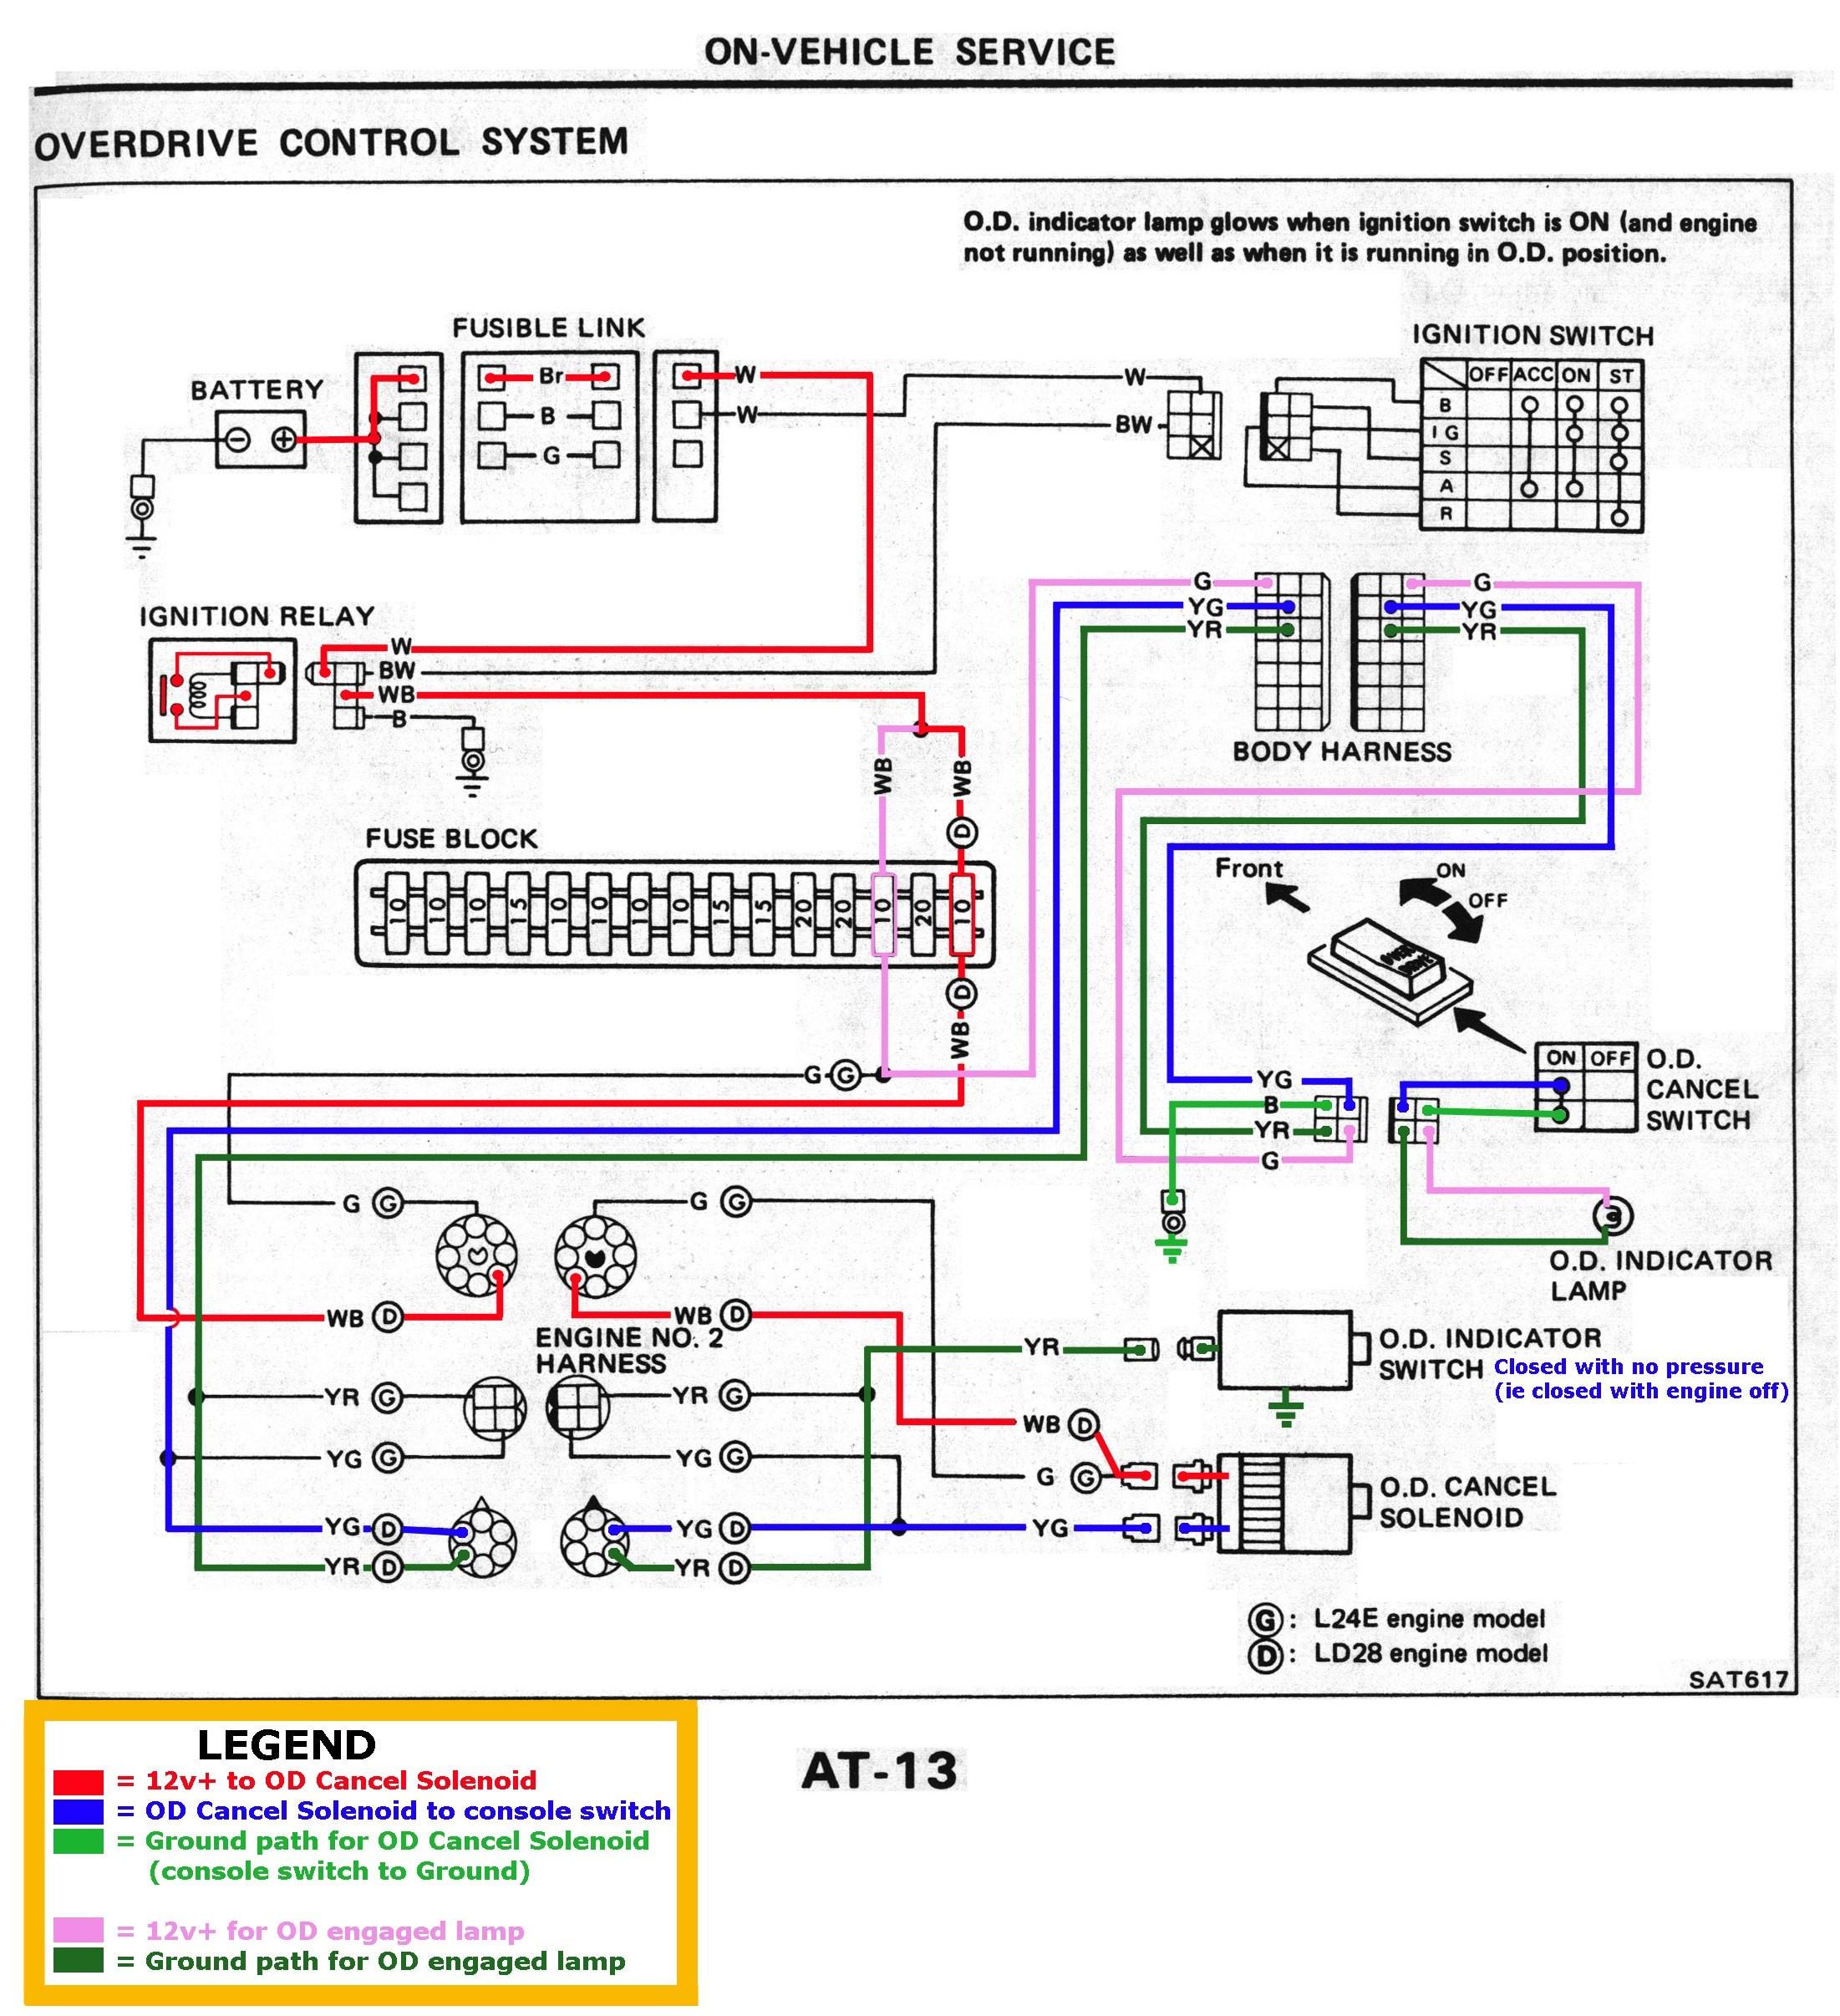 1983 nissan sentra engine diagram data wiring diagrams u2022 rh mikeadkinsguitar com